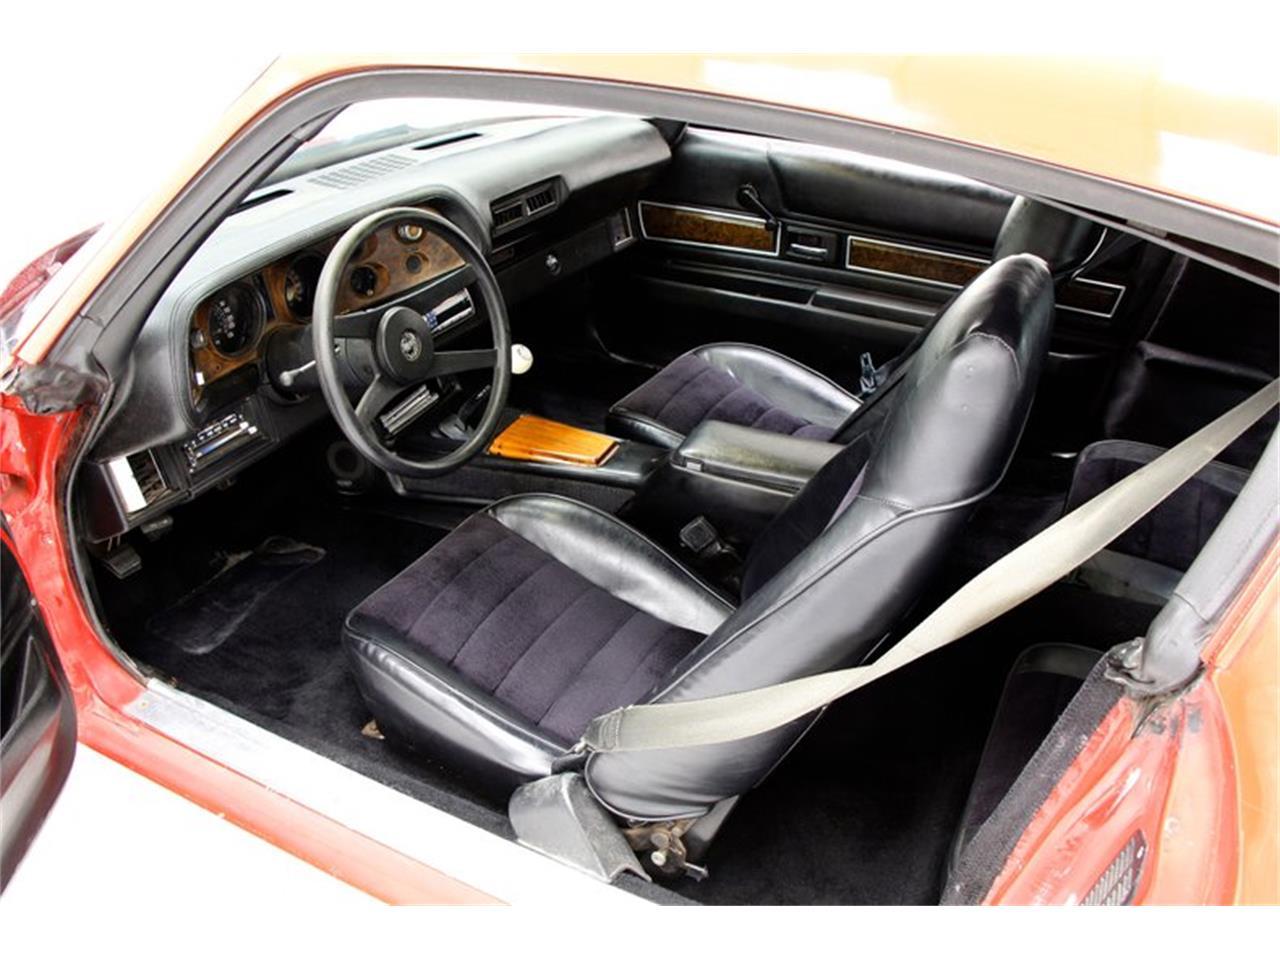 1977 Chevrolet Camaro (CC-1300190) for sale in Morgantown, Pennsylvania